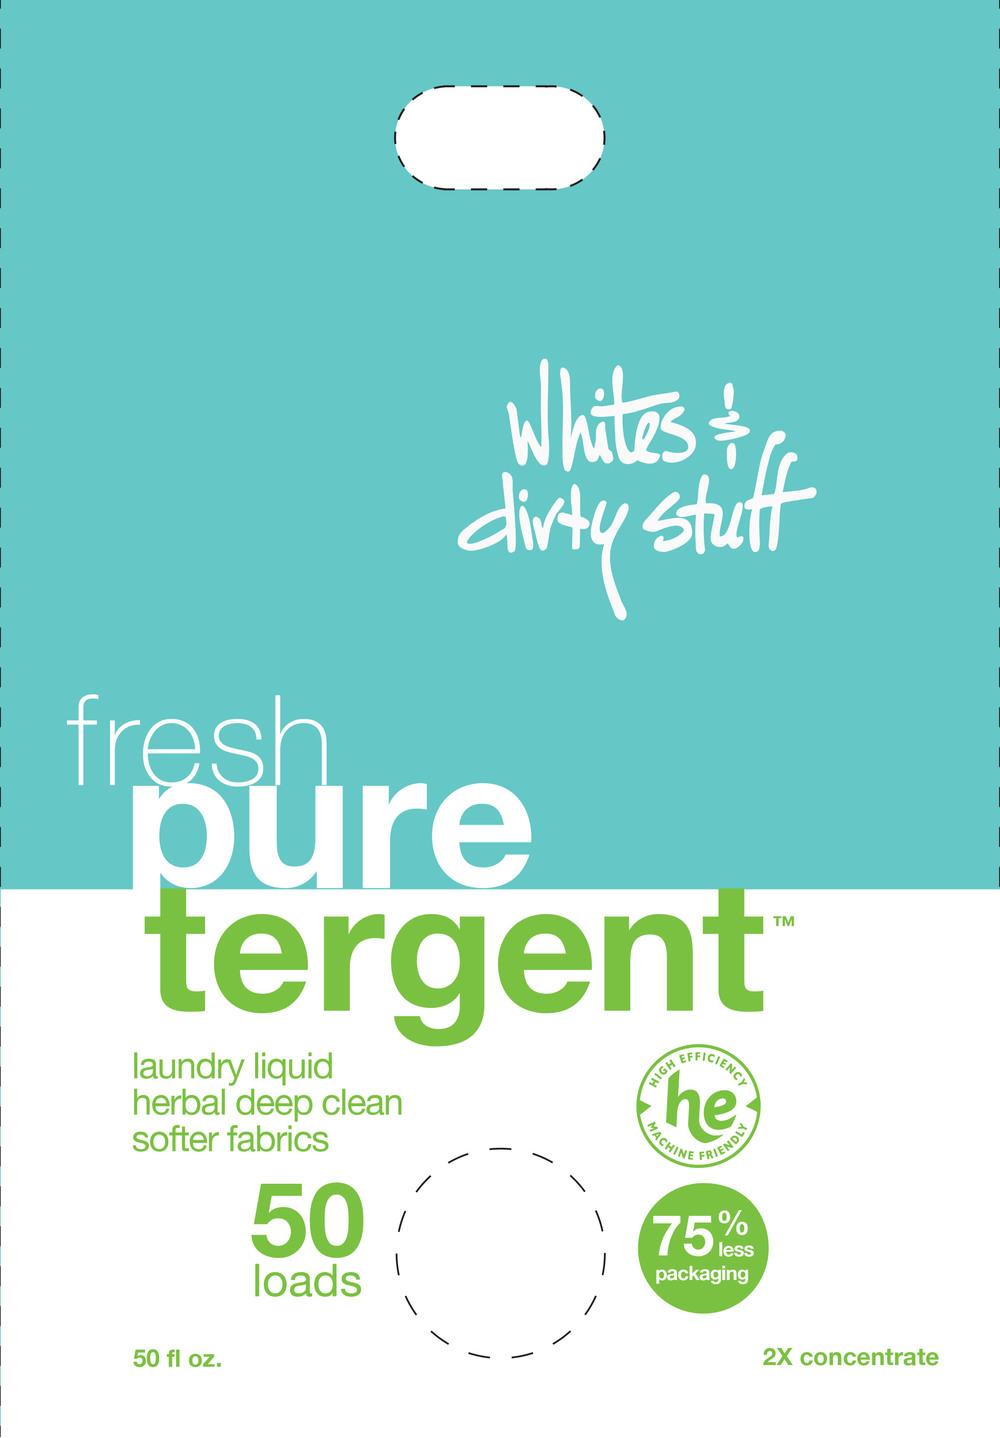 fresh front#5.jpg